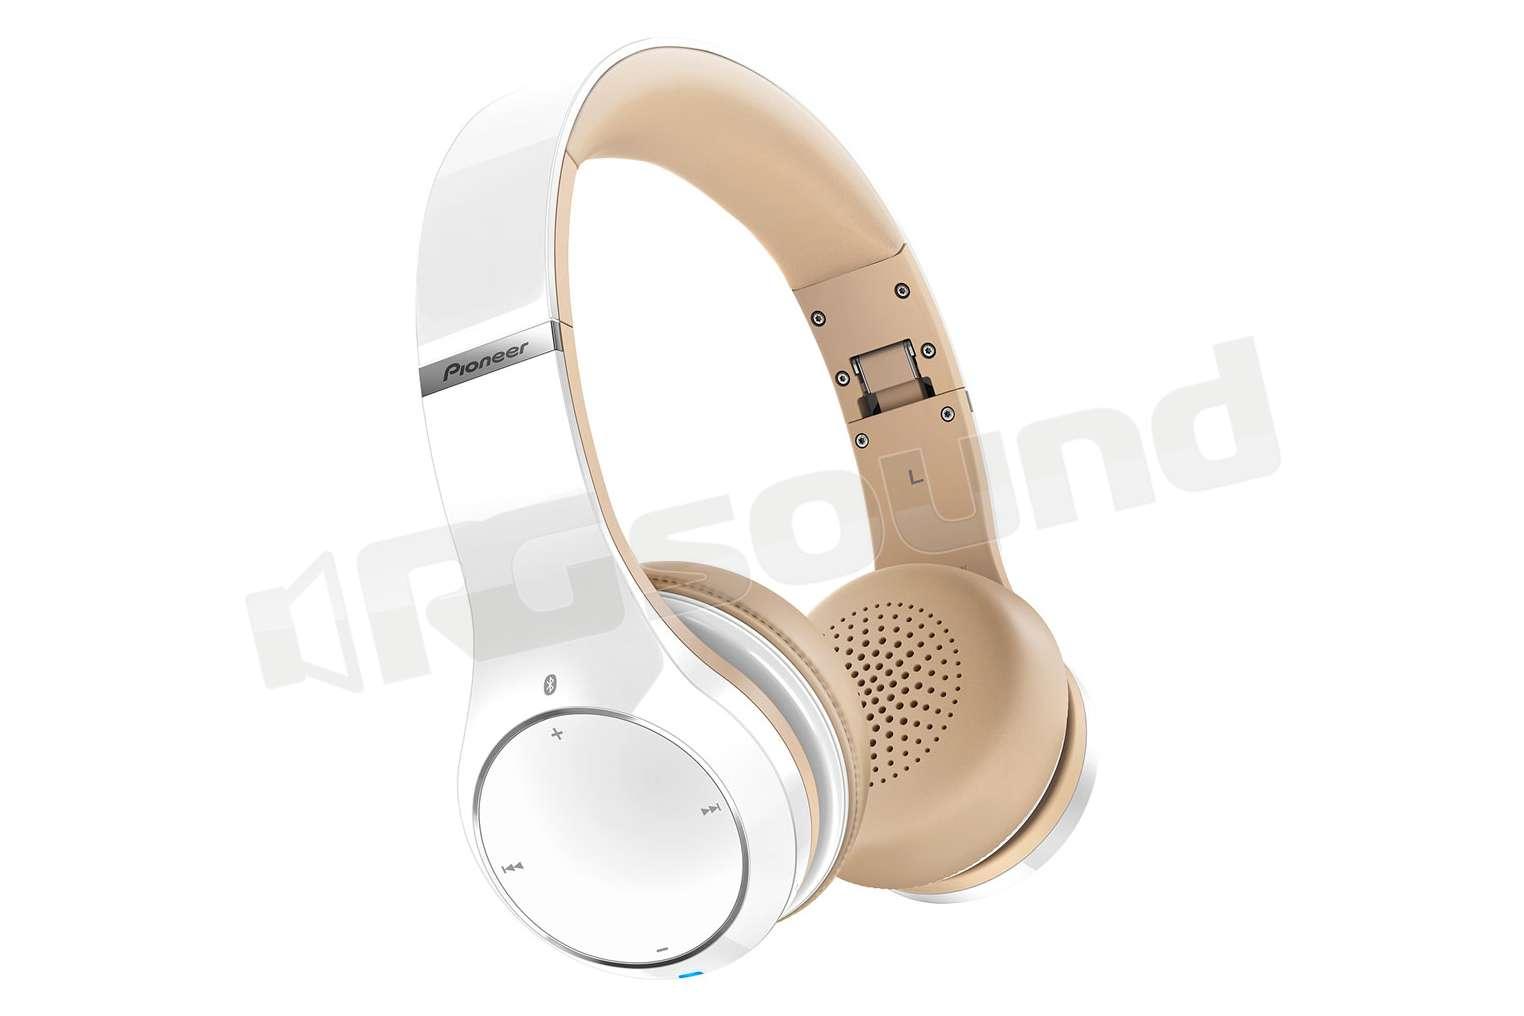 Pioneer SE-MJ771BT-W cuffie Bluetooth NFC finitura bianca e pelle ... a5e6de2530de